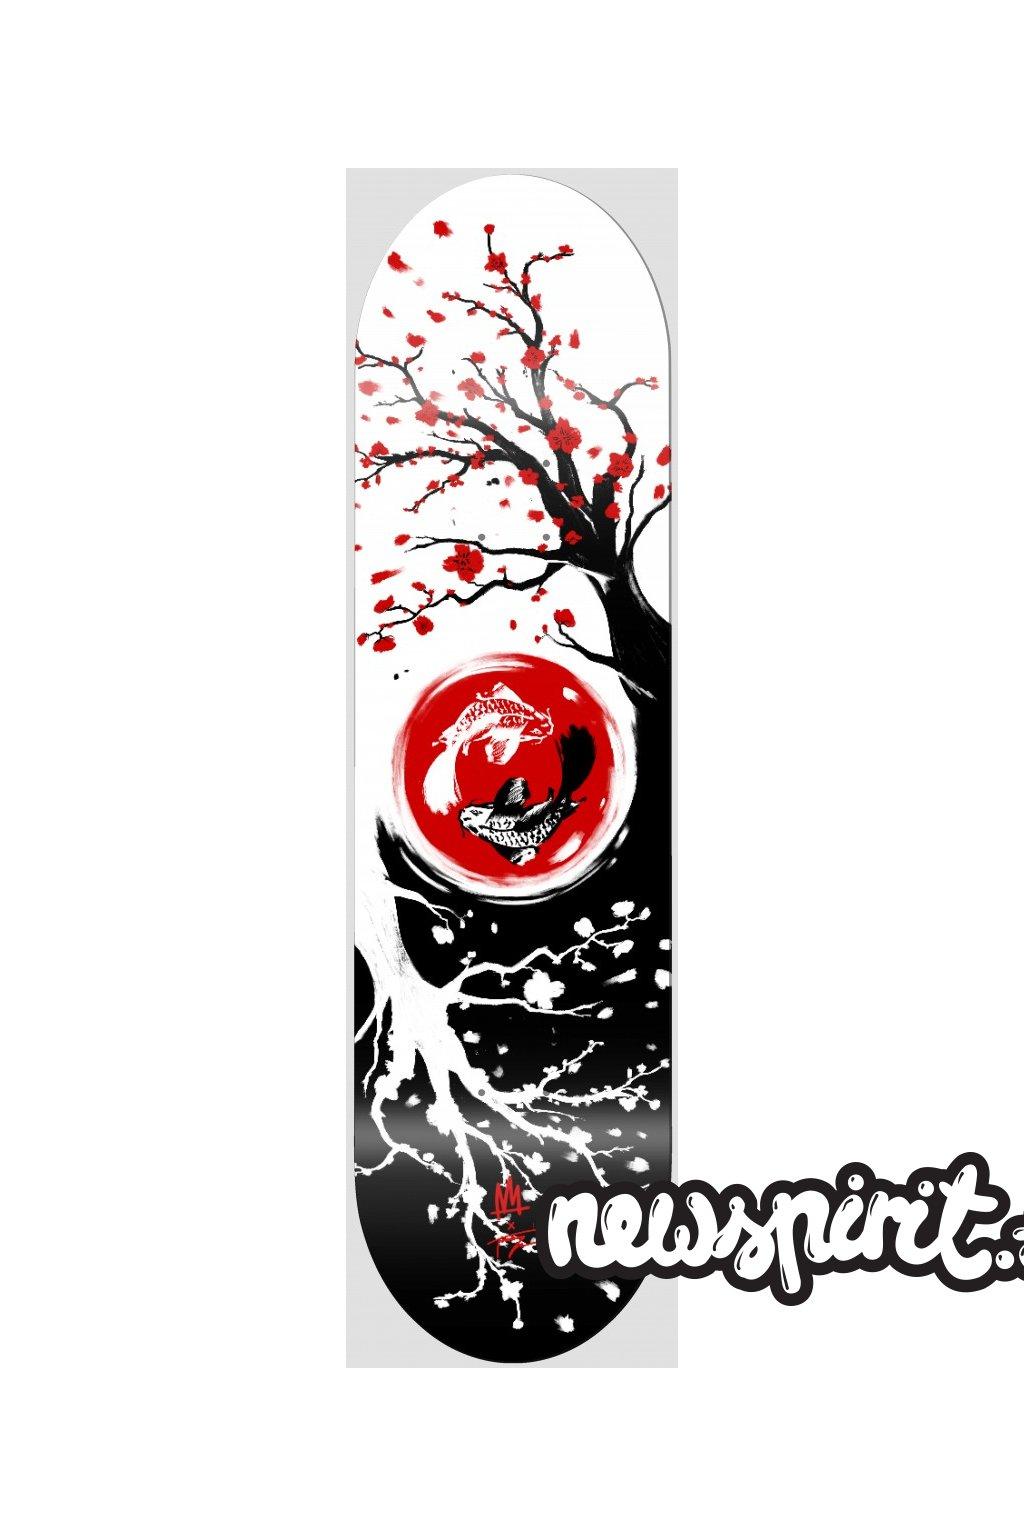 skateboard ambassadors komorebi 1200x1200